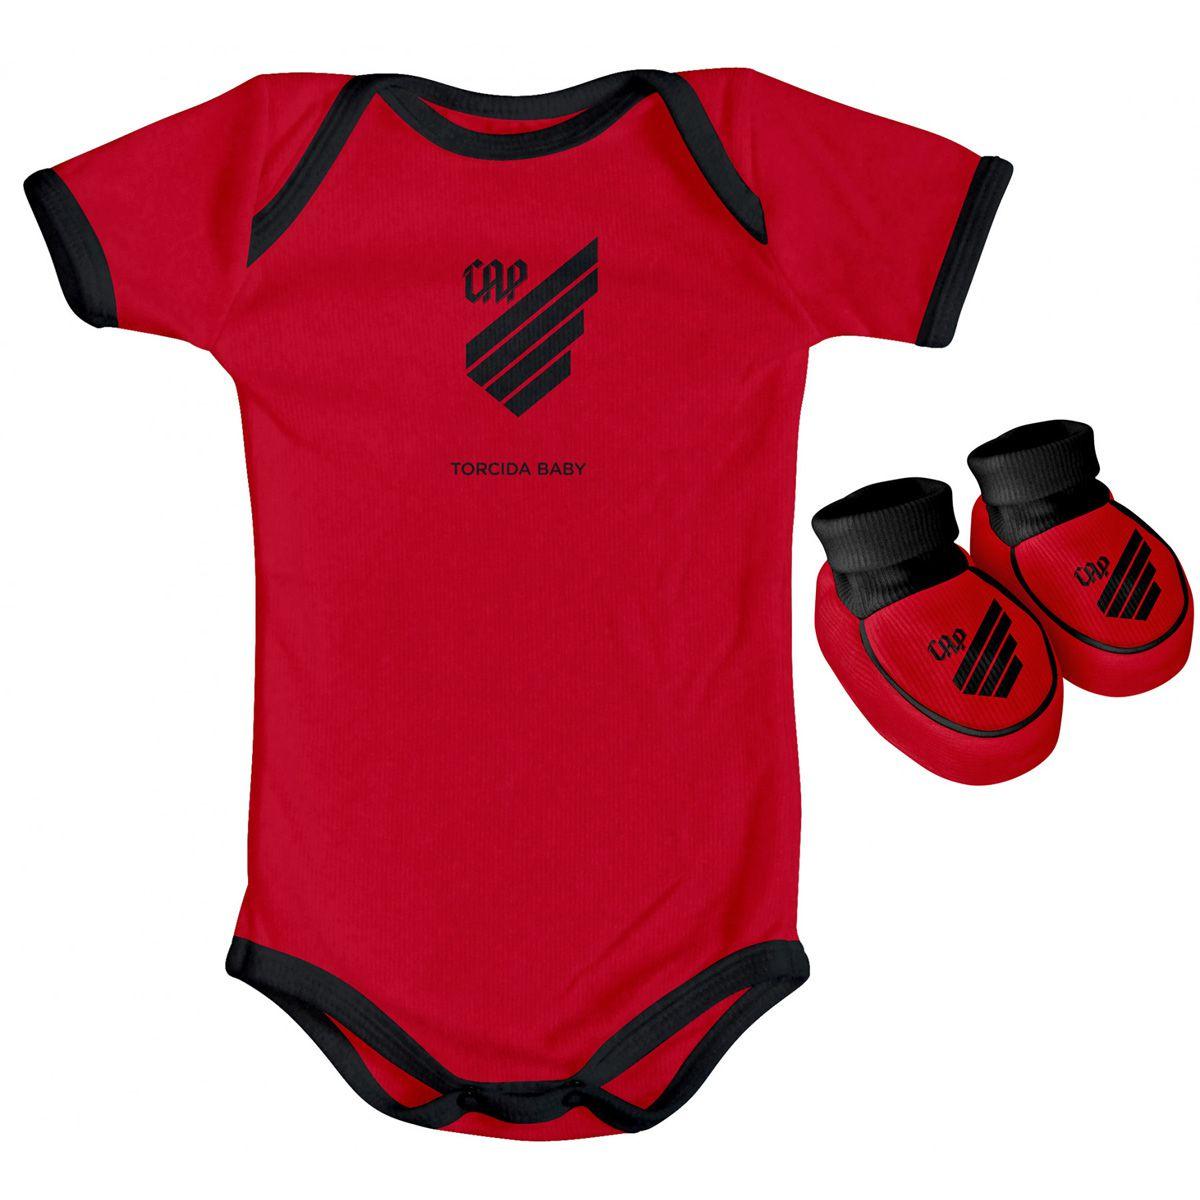 Kit Body + Pantufa para Bebê do Atlético Paranaense